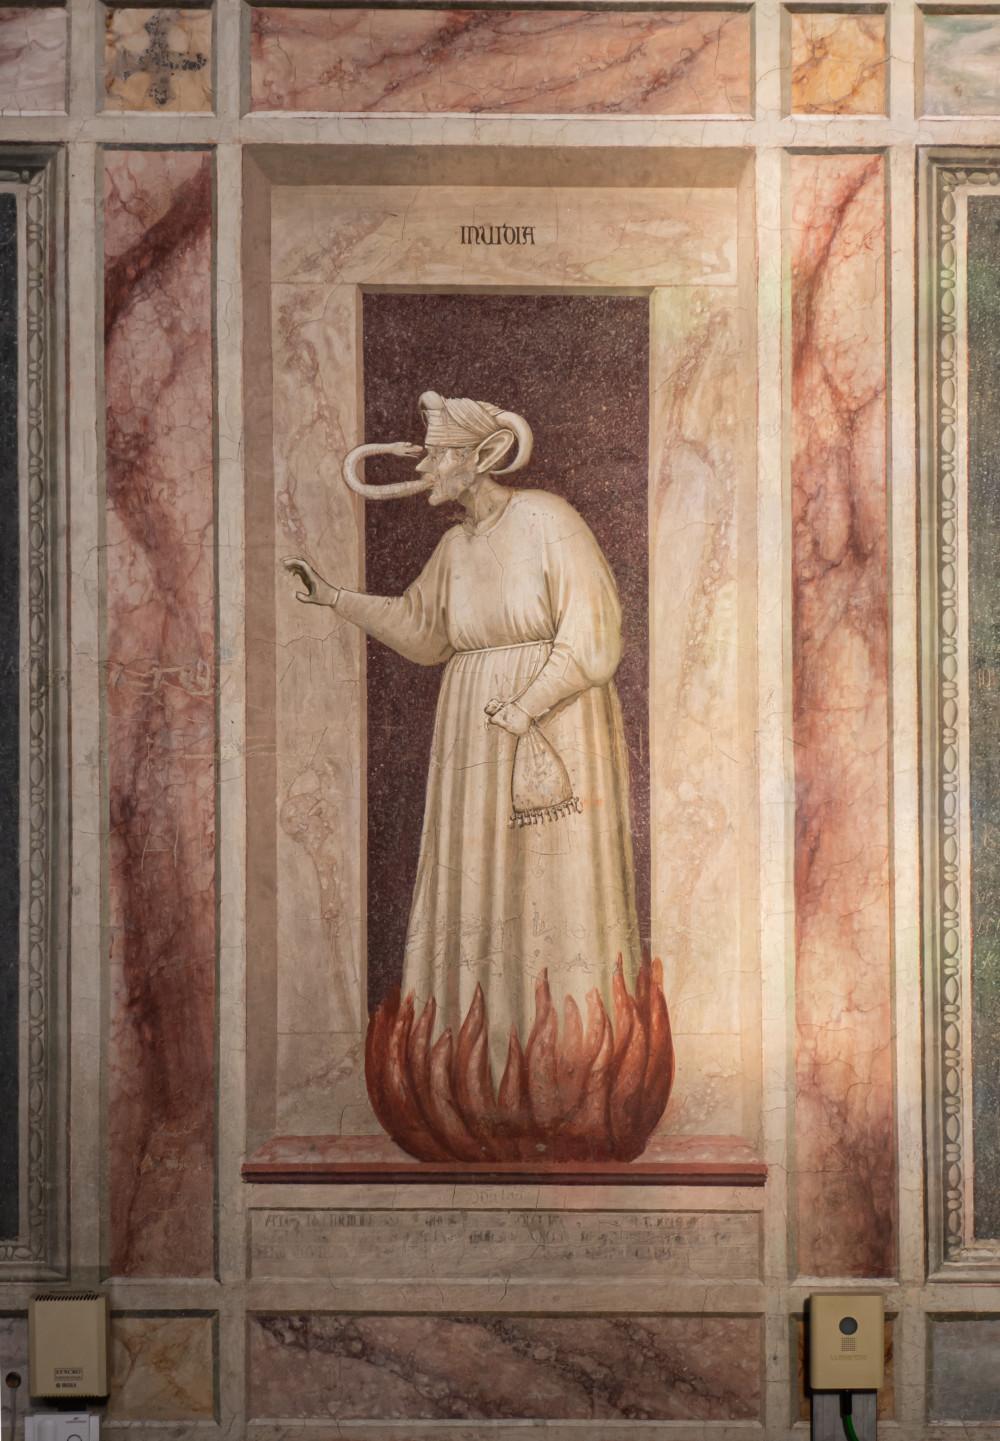 Invidia - een van de ondeugden in de Cappella degli Scrovegni in Padova